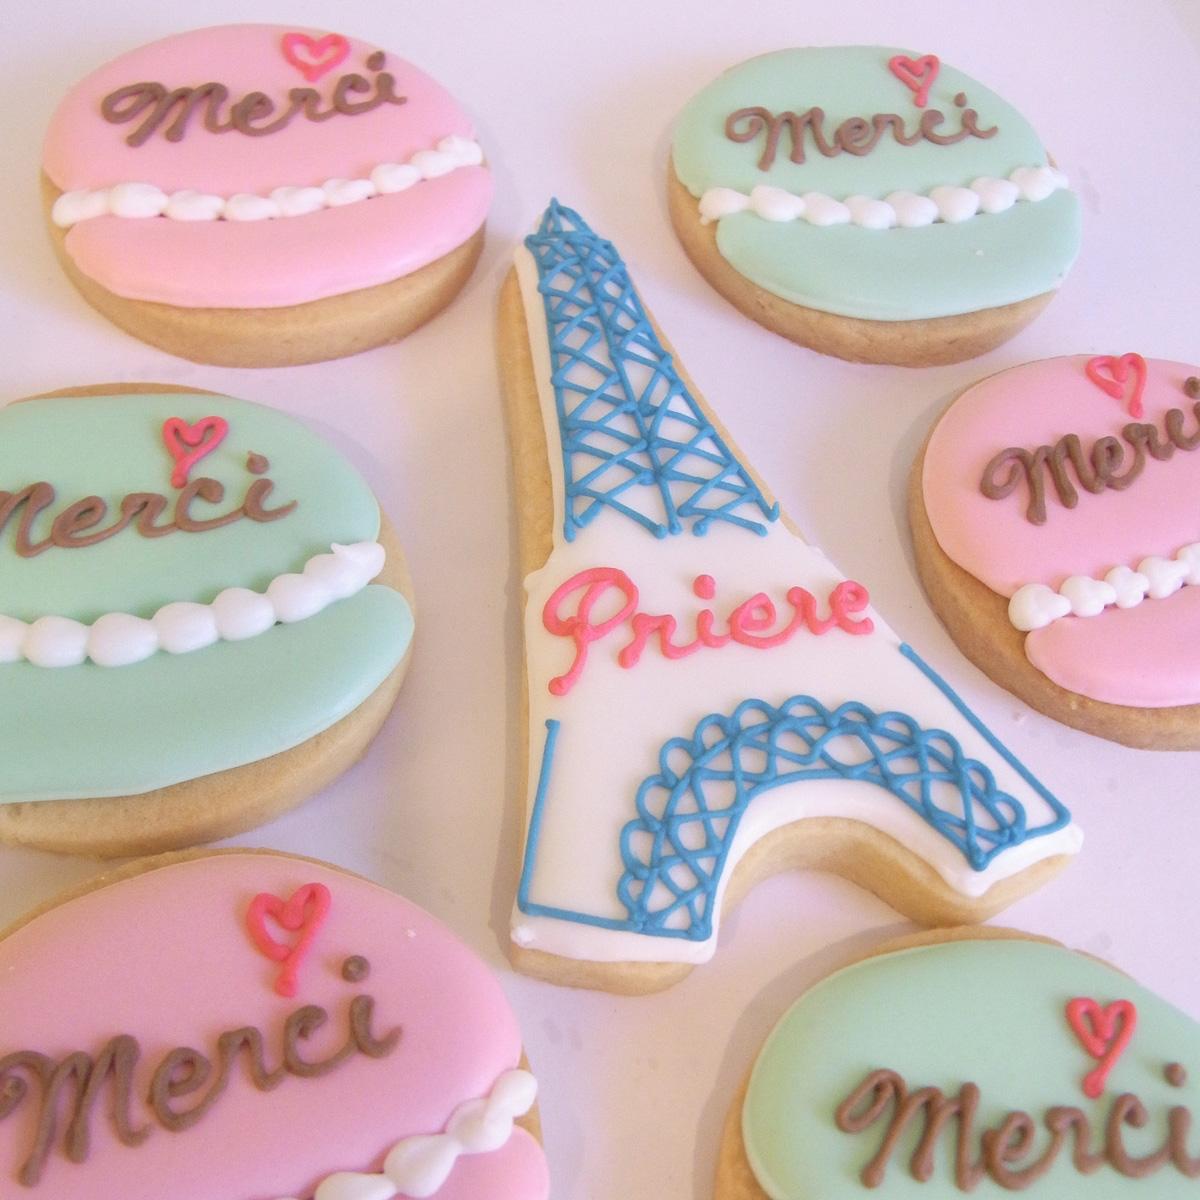 「Priere」ノベルティクッキー